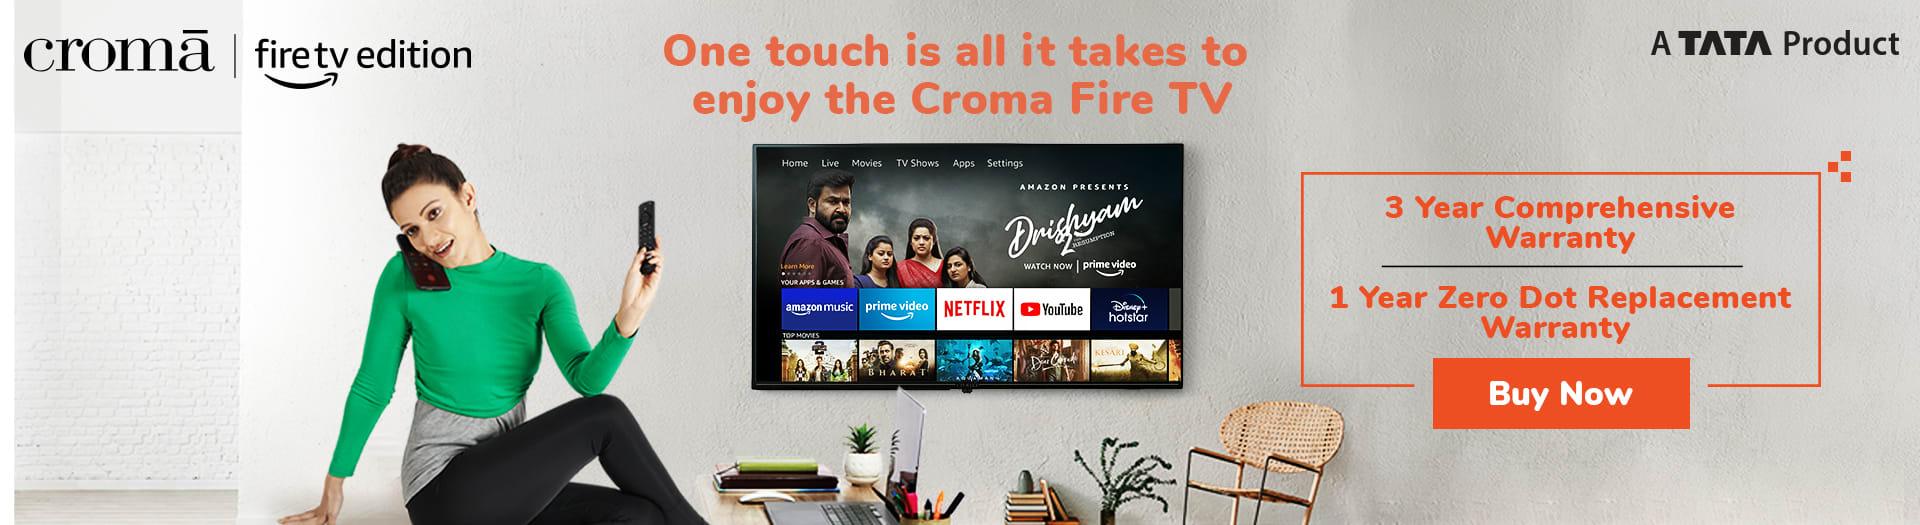 Croma FireTV Edition